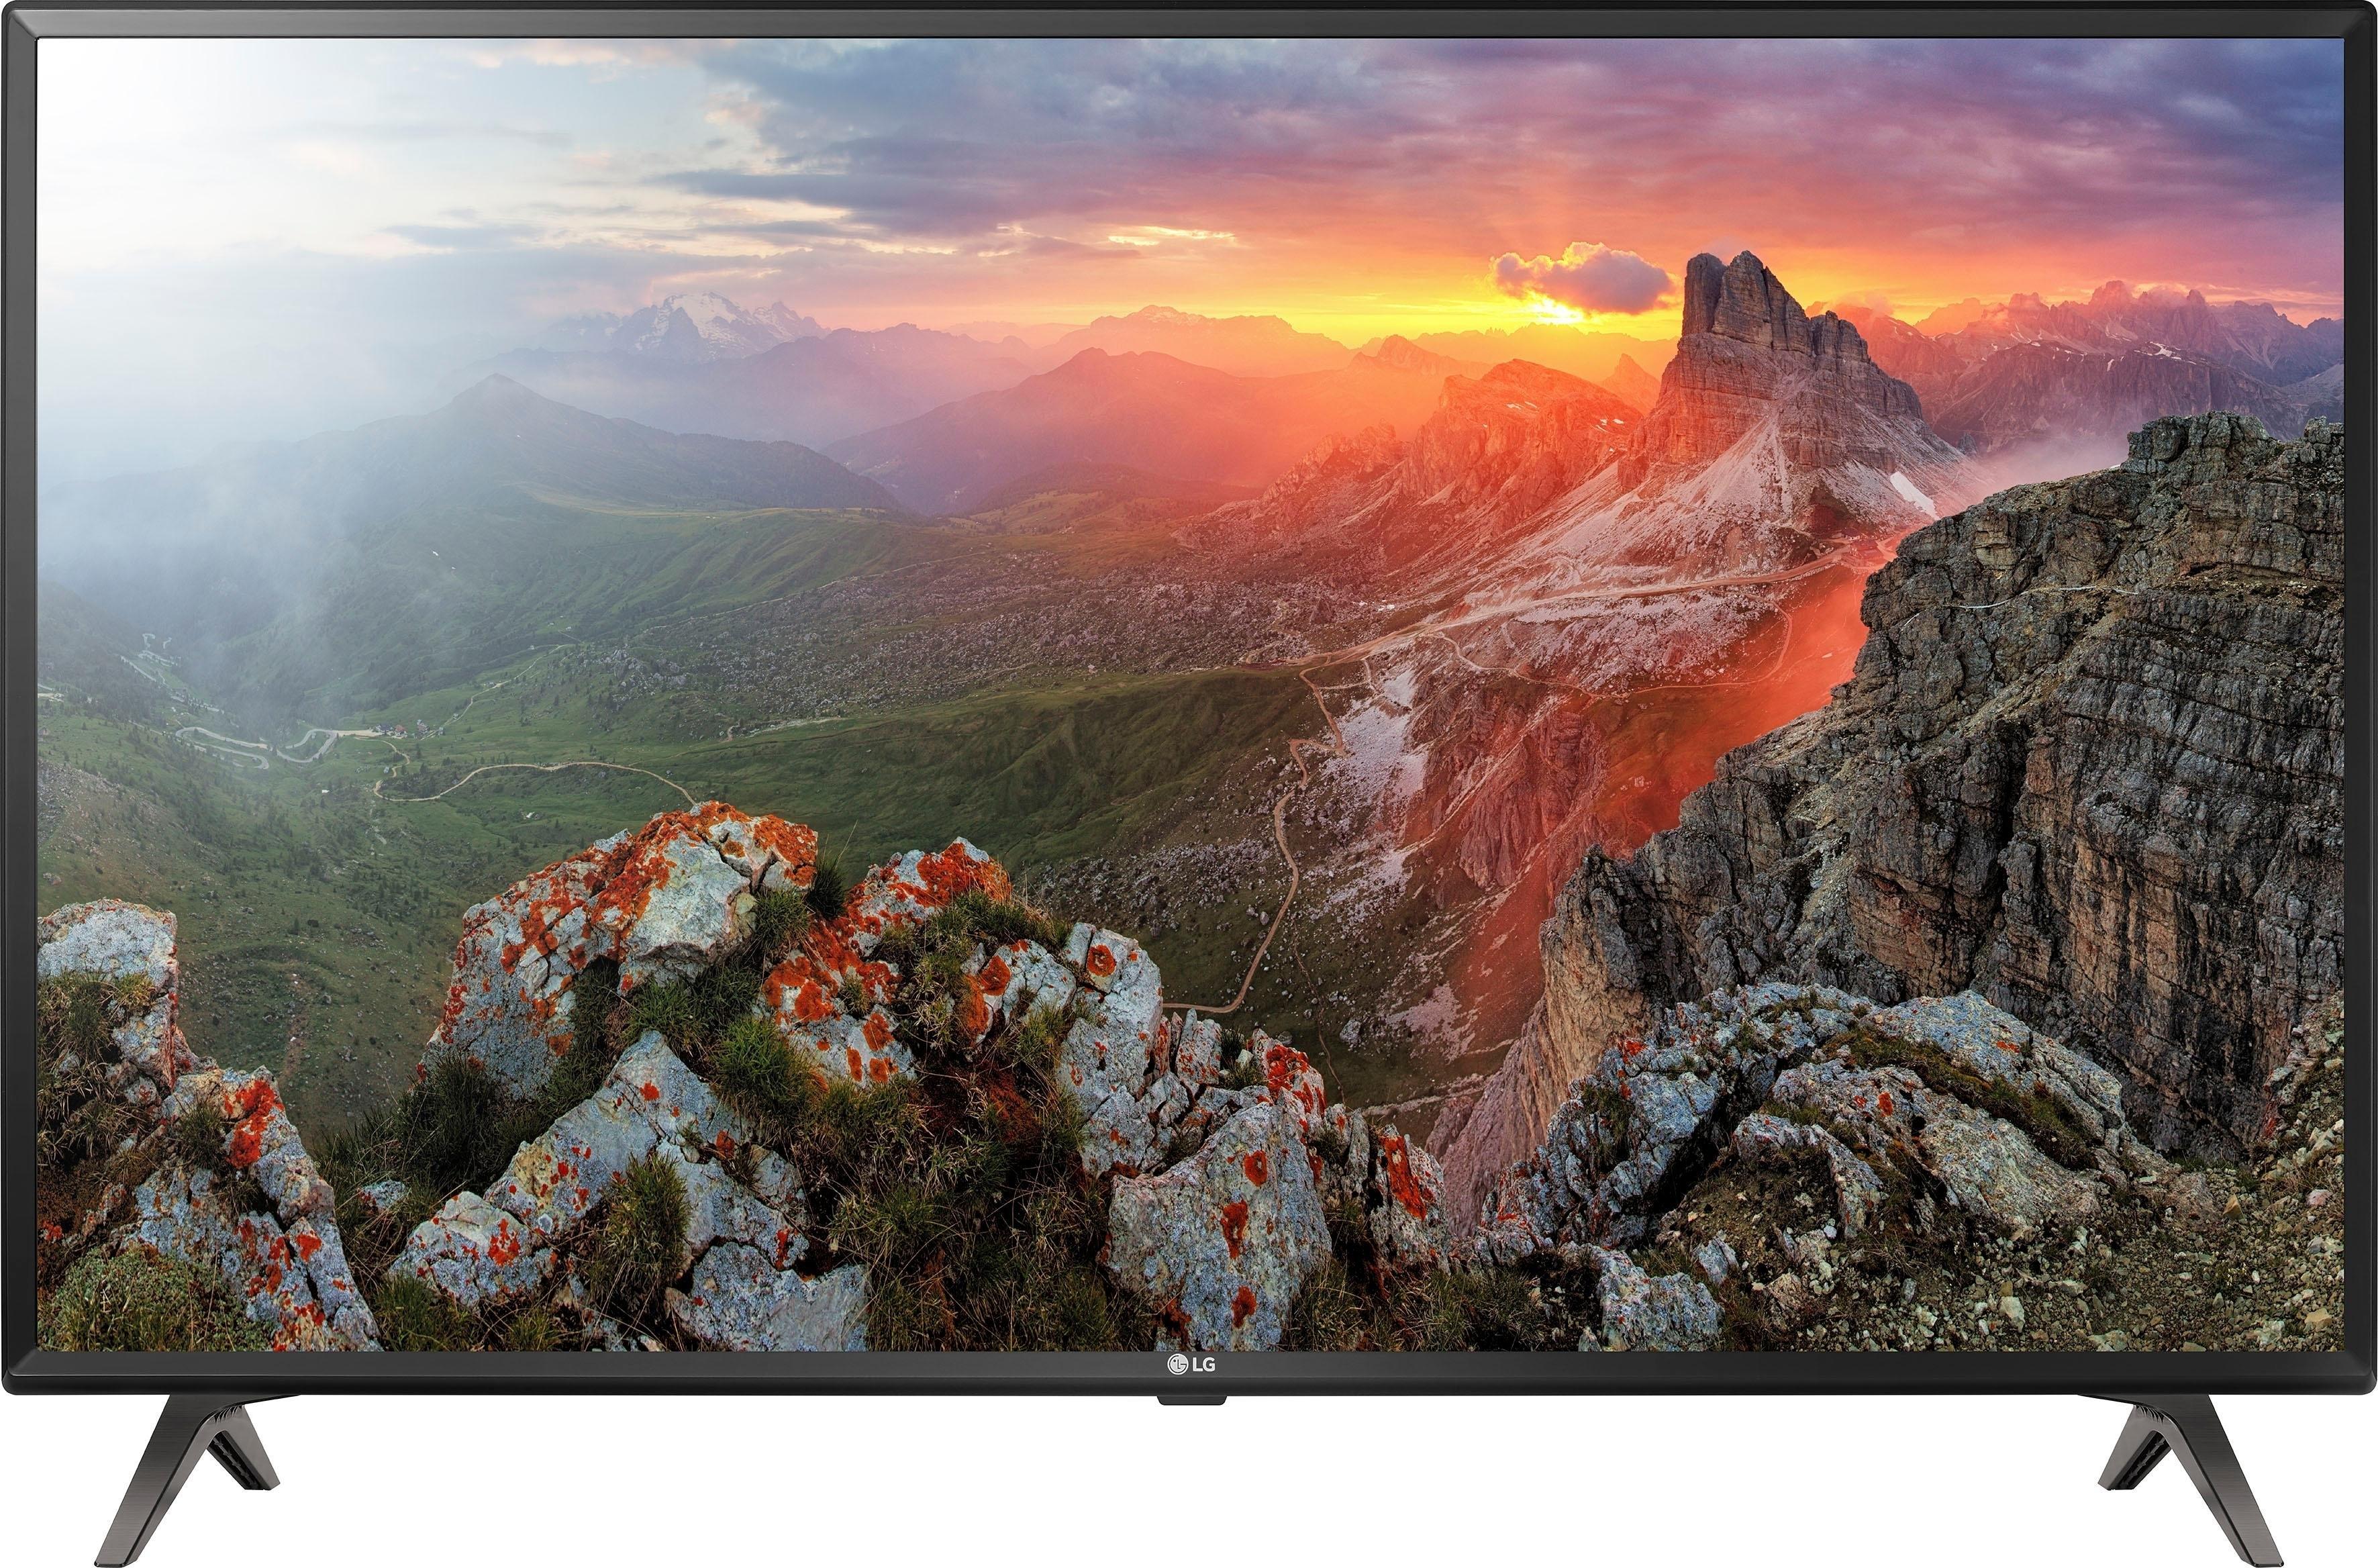 LG 50UK6300LLB led-tv (127 cm / (50 inch), 4K Ultra HD, smart-tv voordelig en veilig online kopen